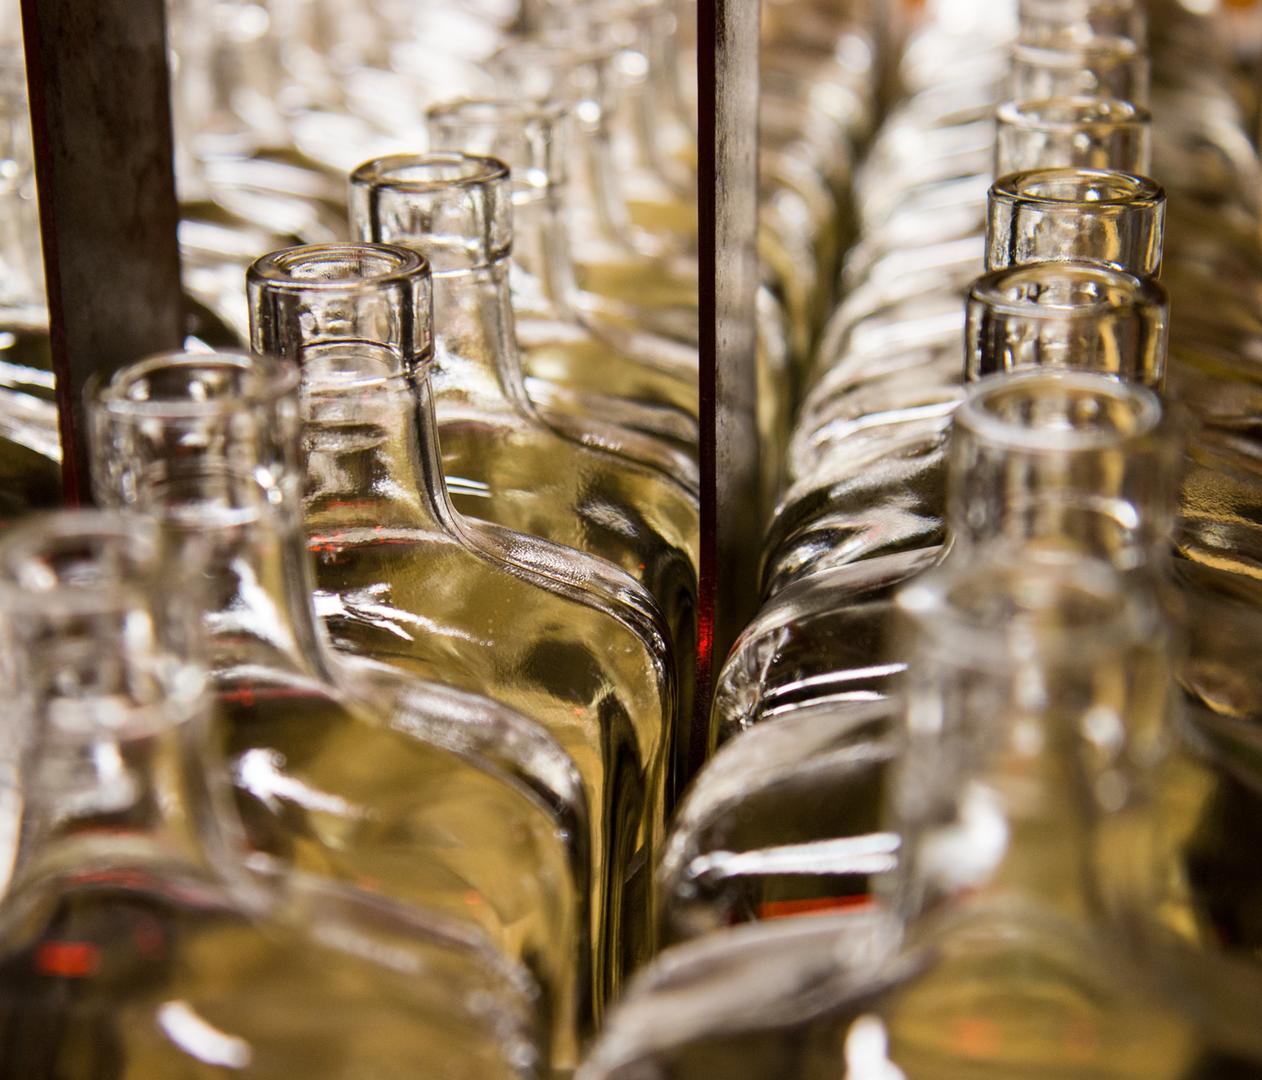 Glasflaschen © Chance - addobe.stock.com